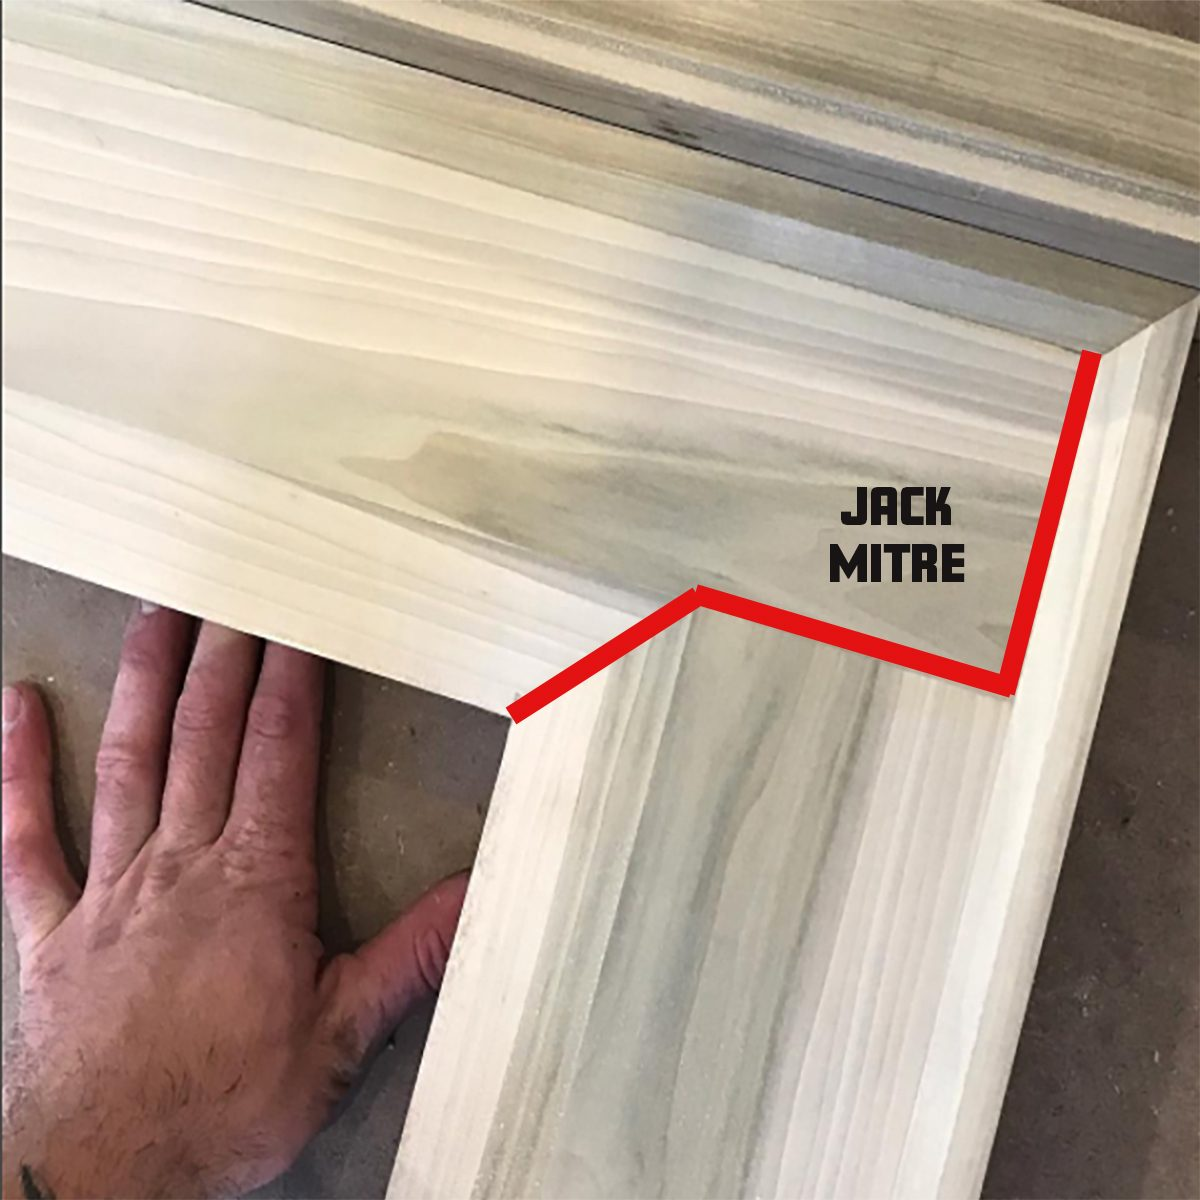 A Jack Miter | Construction Pro Tips